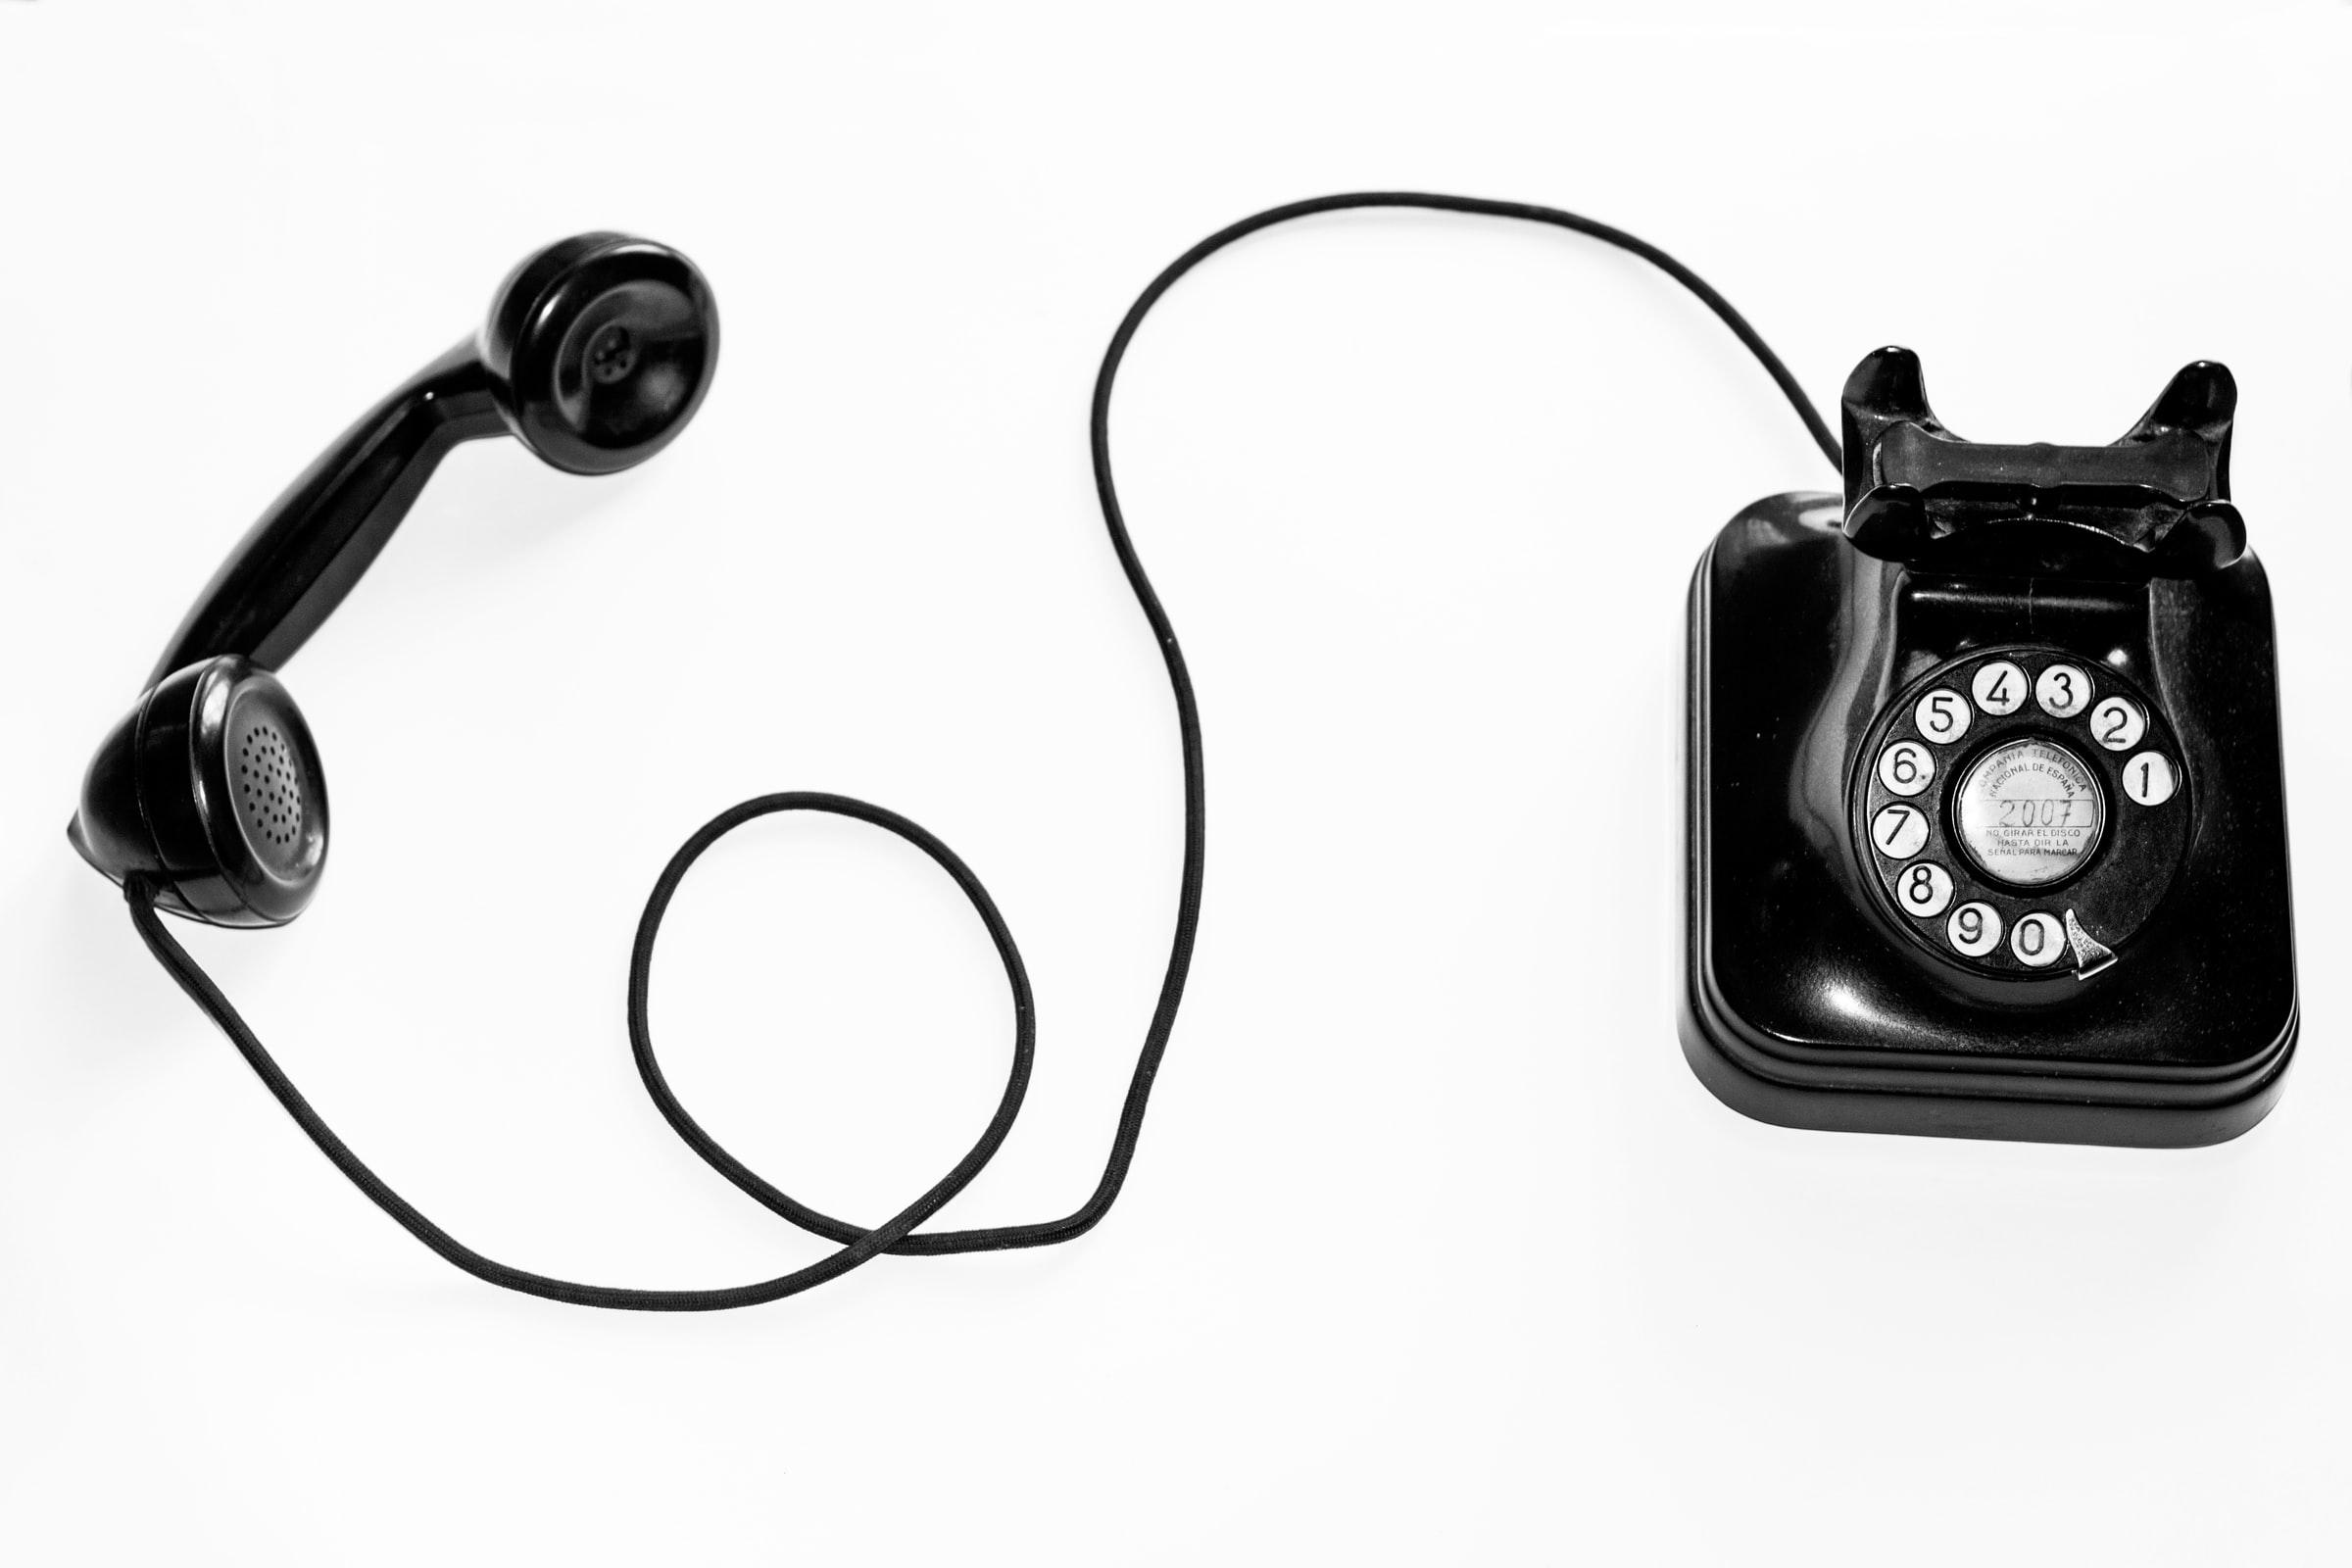 Noah & Zoey Launch Dial-A-Friend Hotline With 1800-FRIENDS